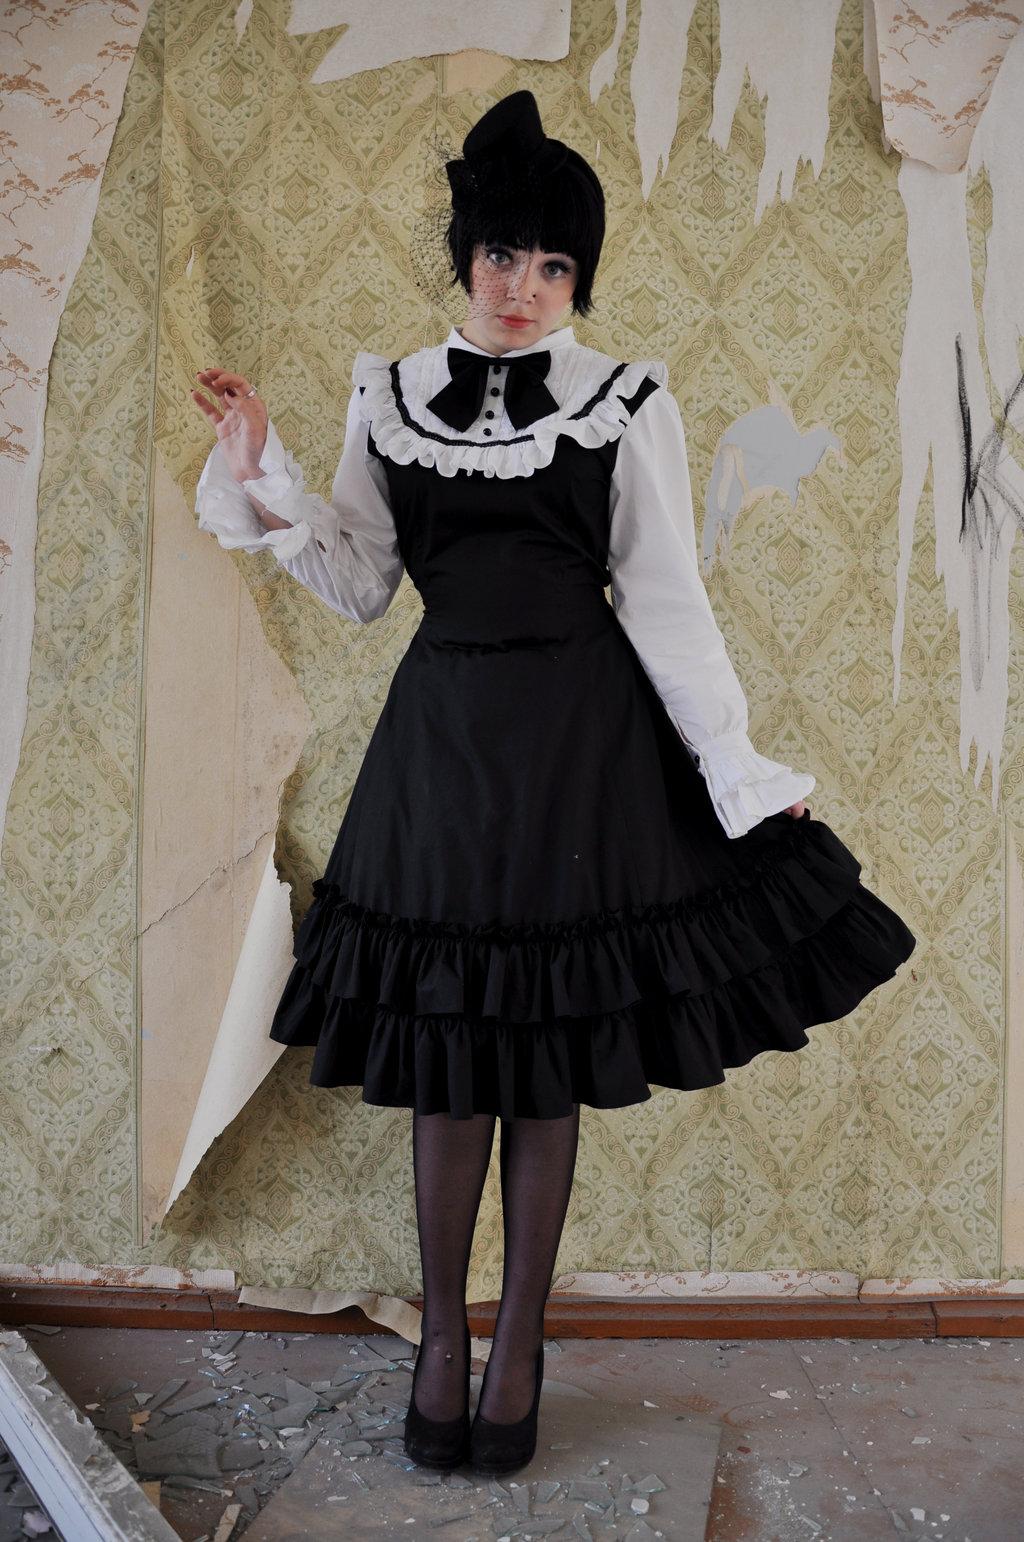 Gothic Lolita - forrás: kechake-stock.deviantart.com